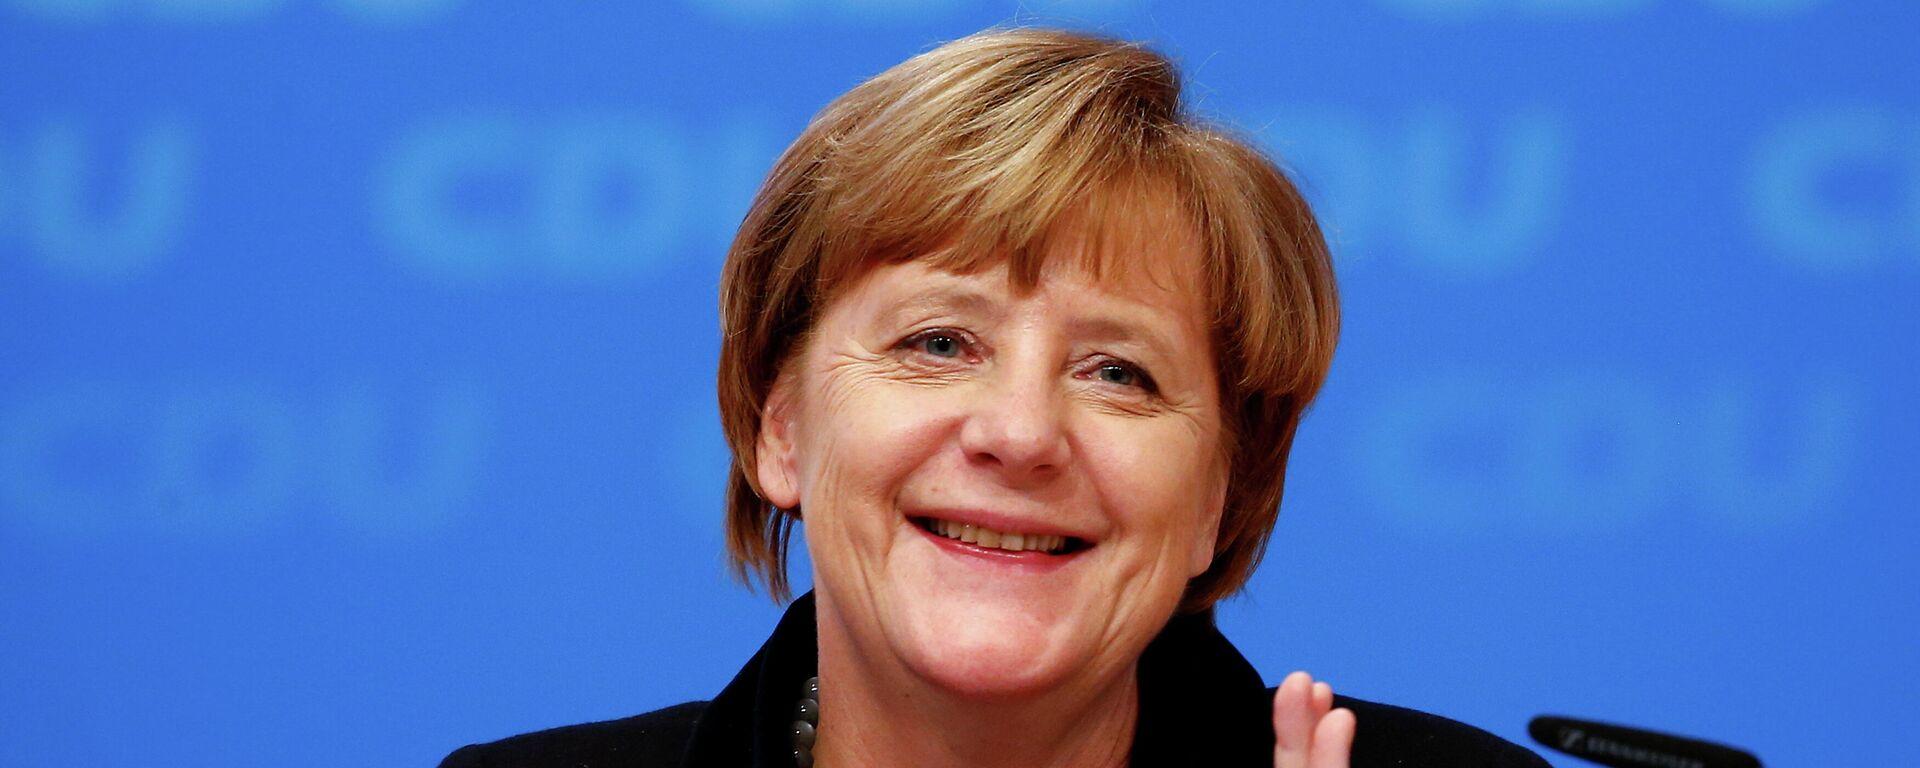 Angela Merkel - SNA, 1920, 09.10.2021